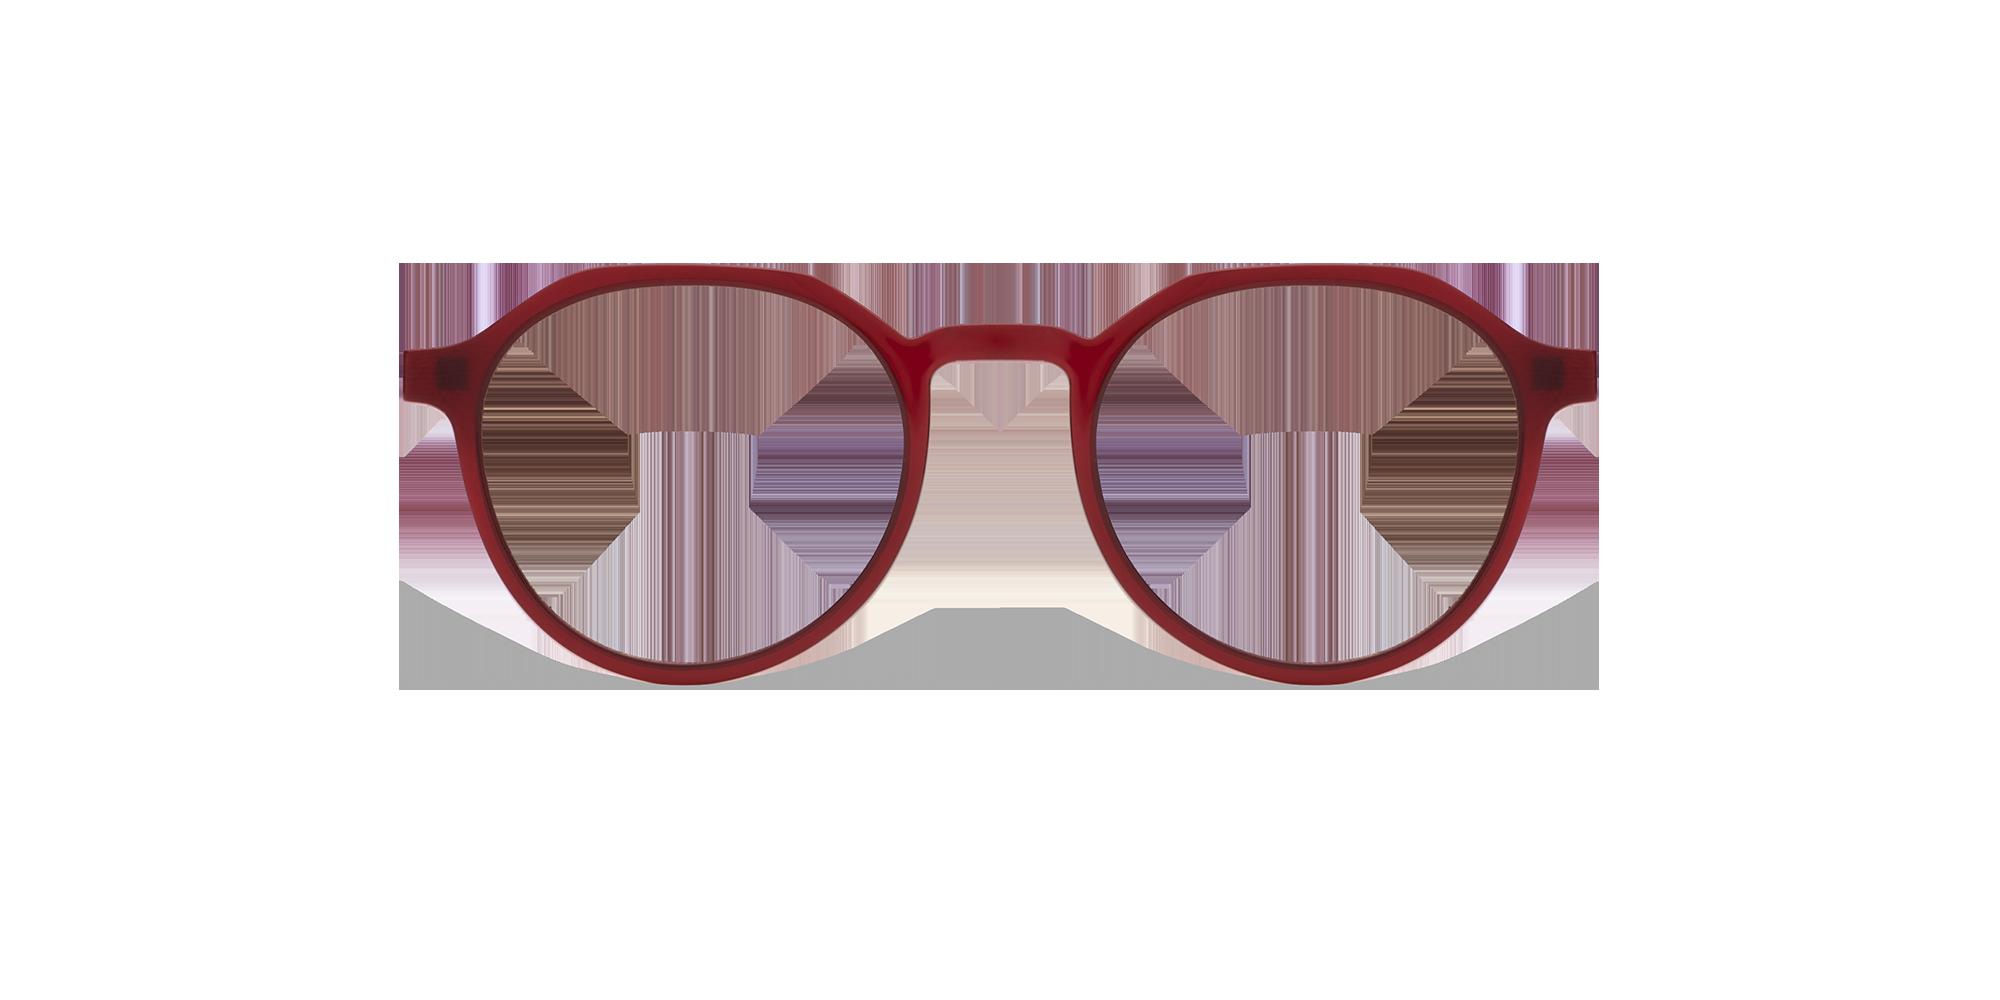 afflelou/france/products/smart_clip/clips_glasses/07630036429006_face.png